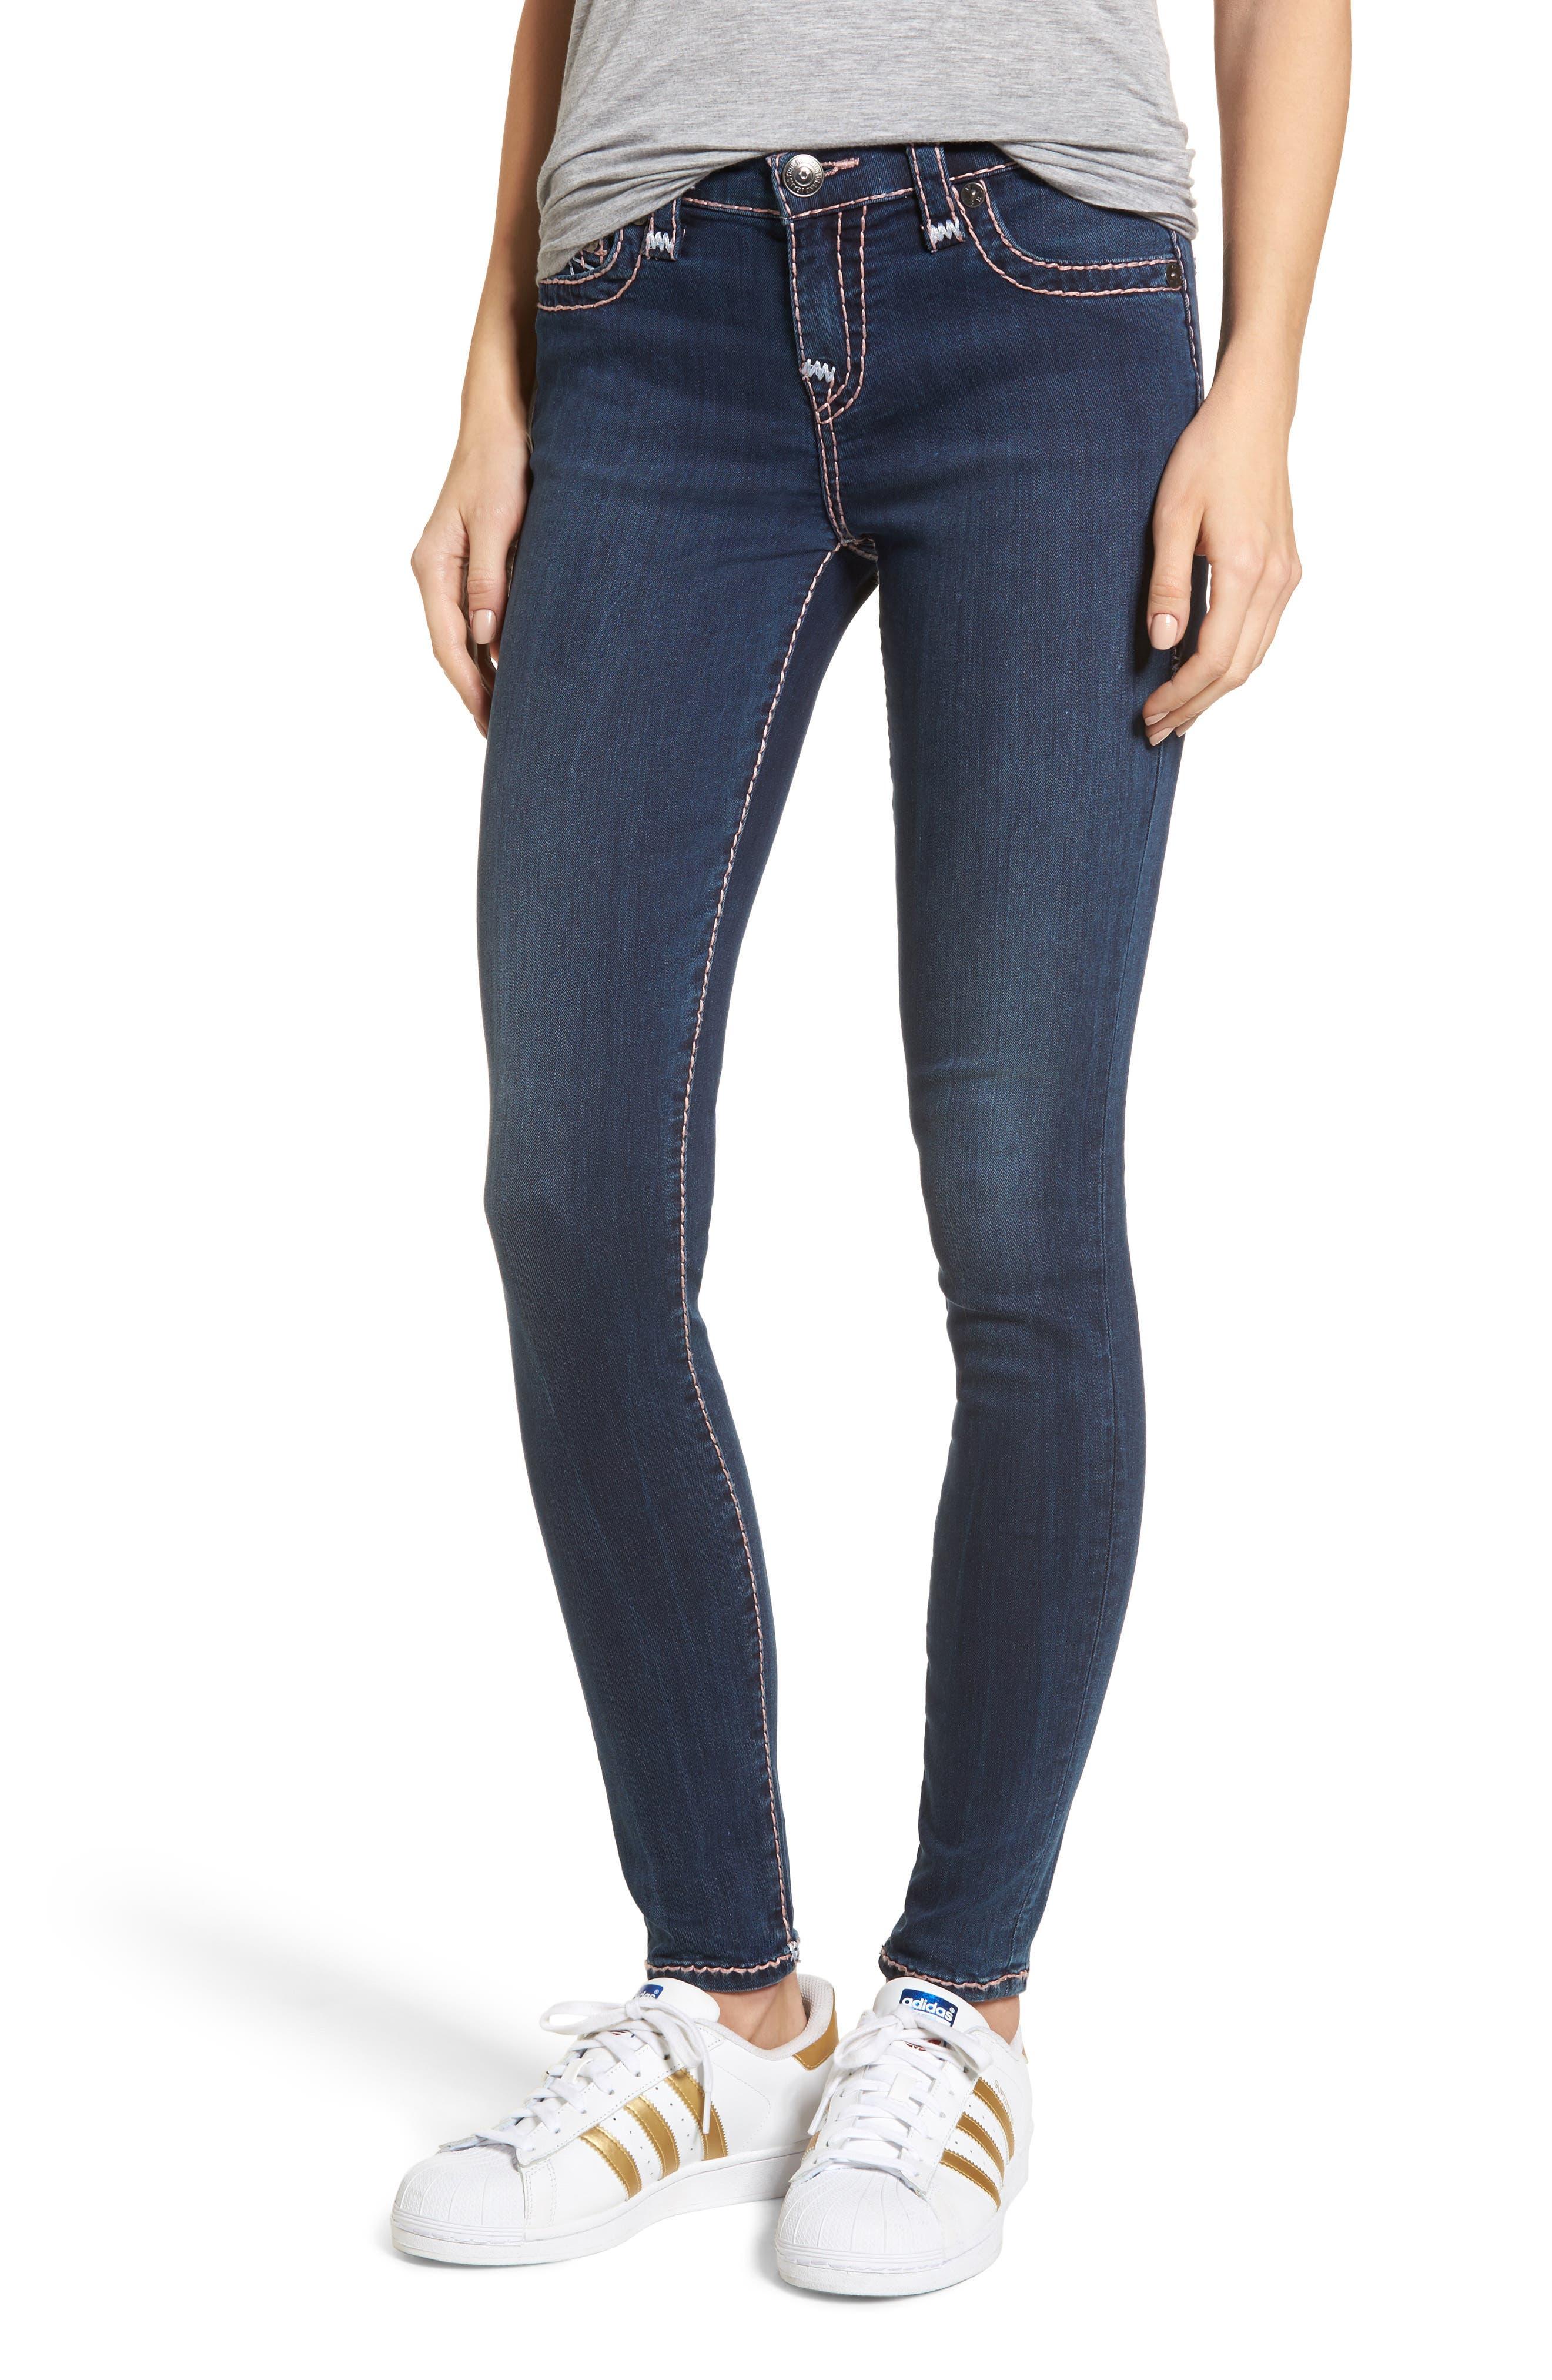 True Religion Brand Jeans Halle Super Skinny Jeans (Deep Sea Blue)